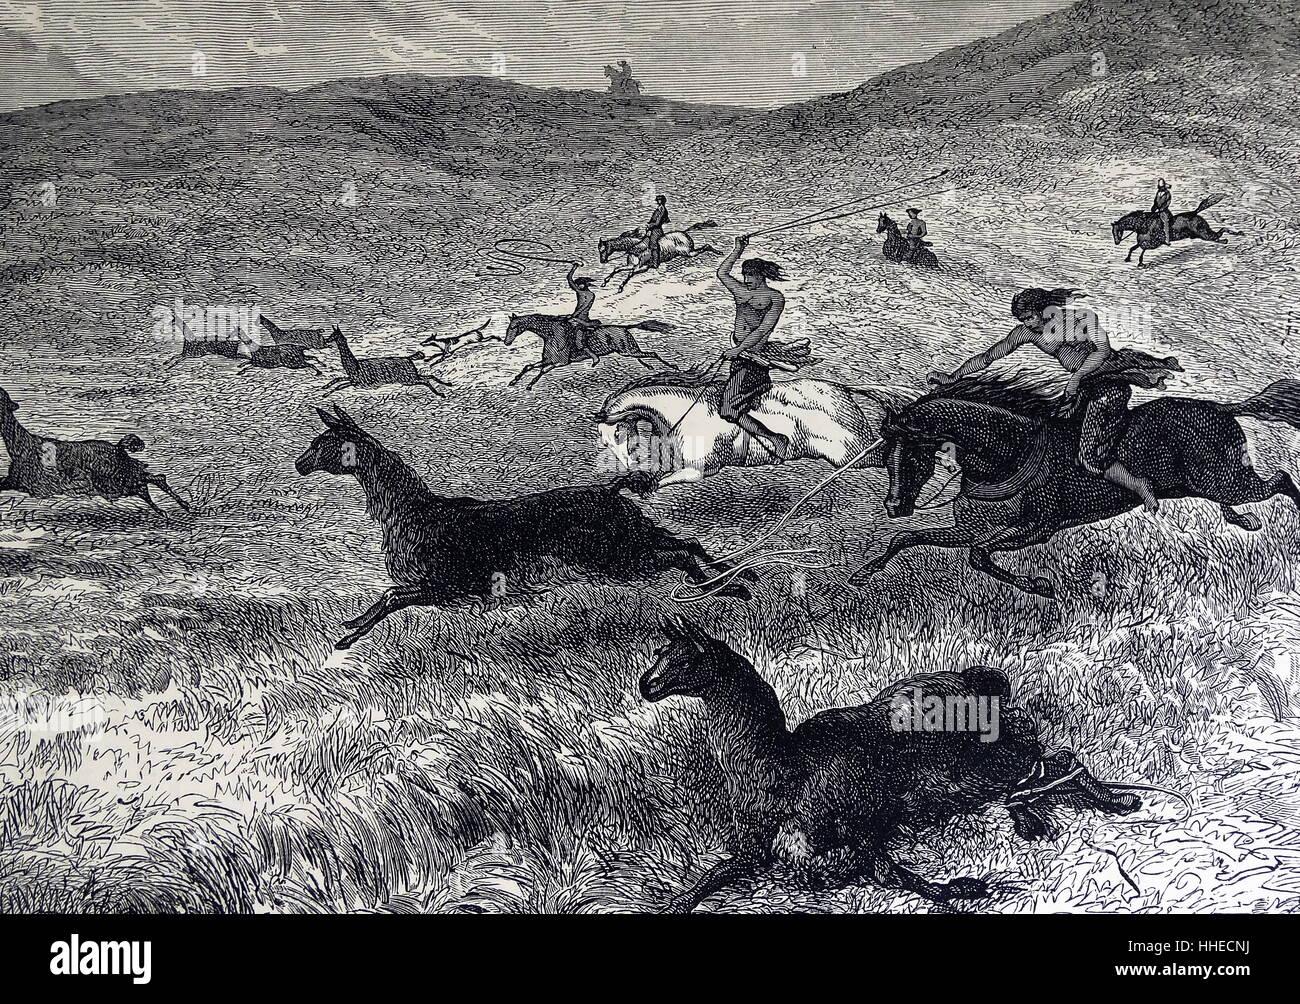 Hunting Guanaco (Lama guanaco) on the Pampas. - Stock Image